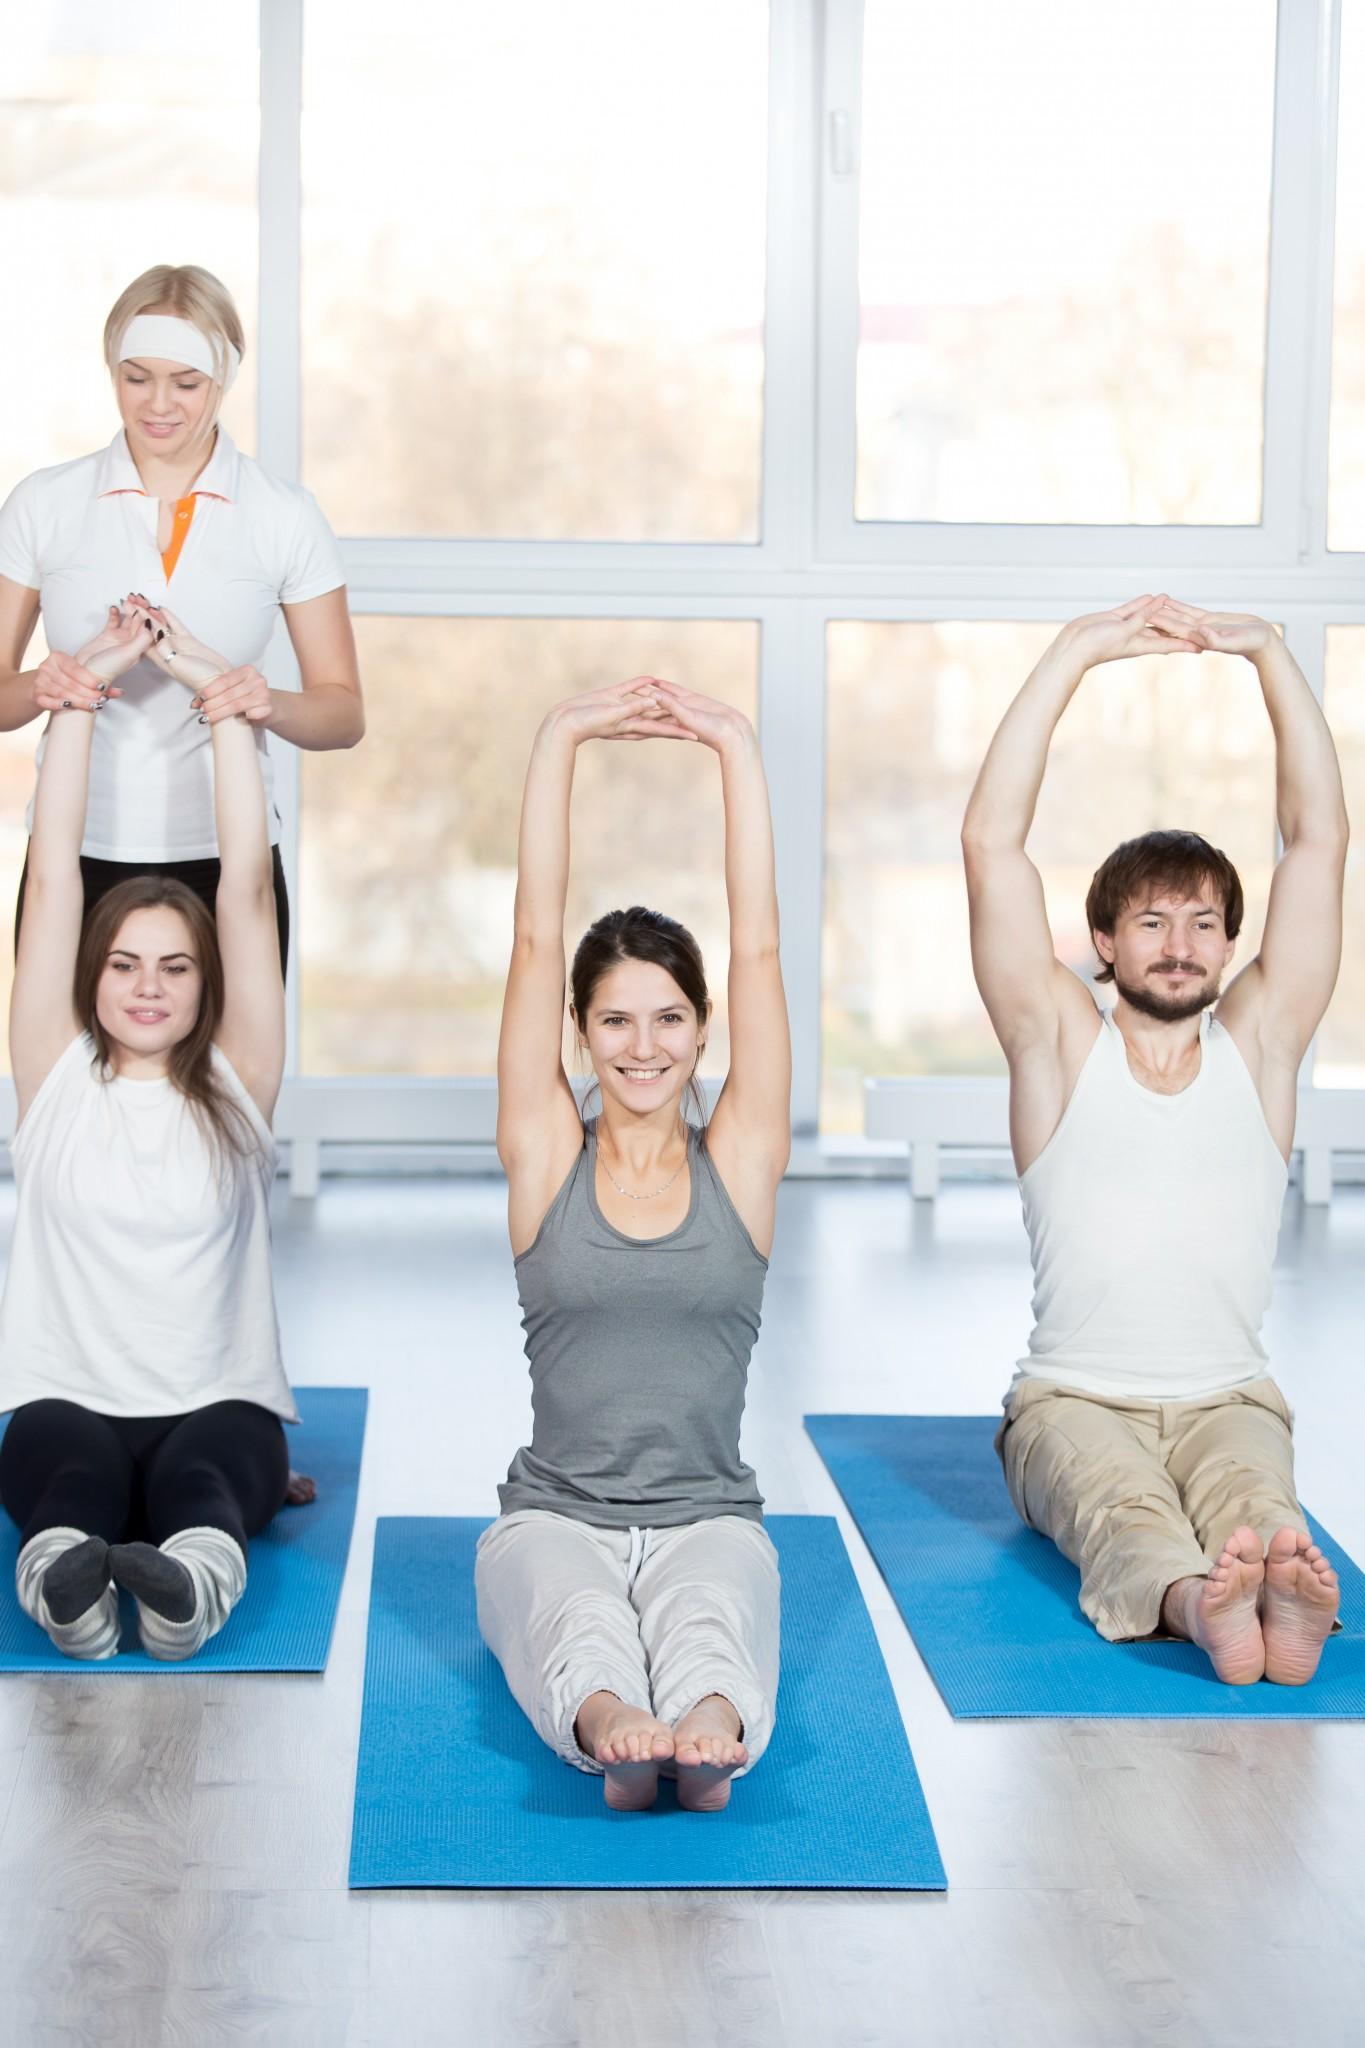 Yoga Meditation Classes Gentle Place Wellness Center Framingham